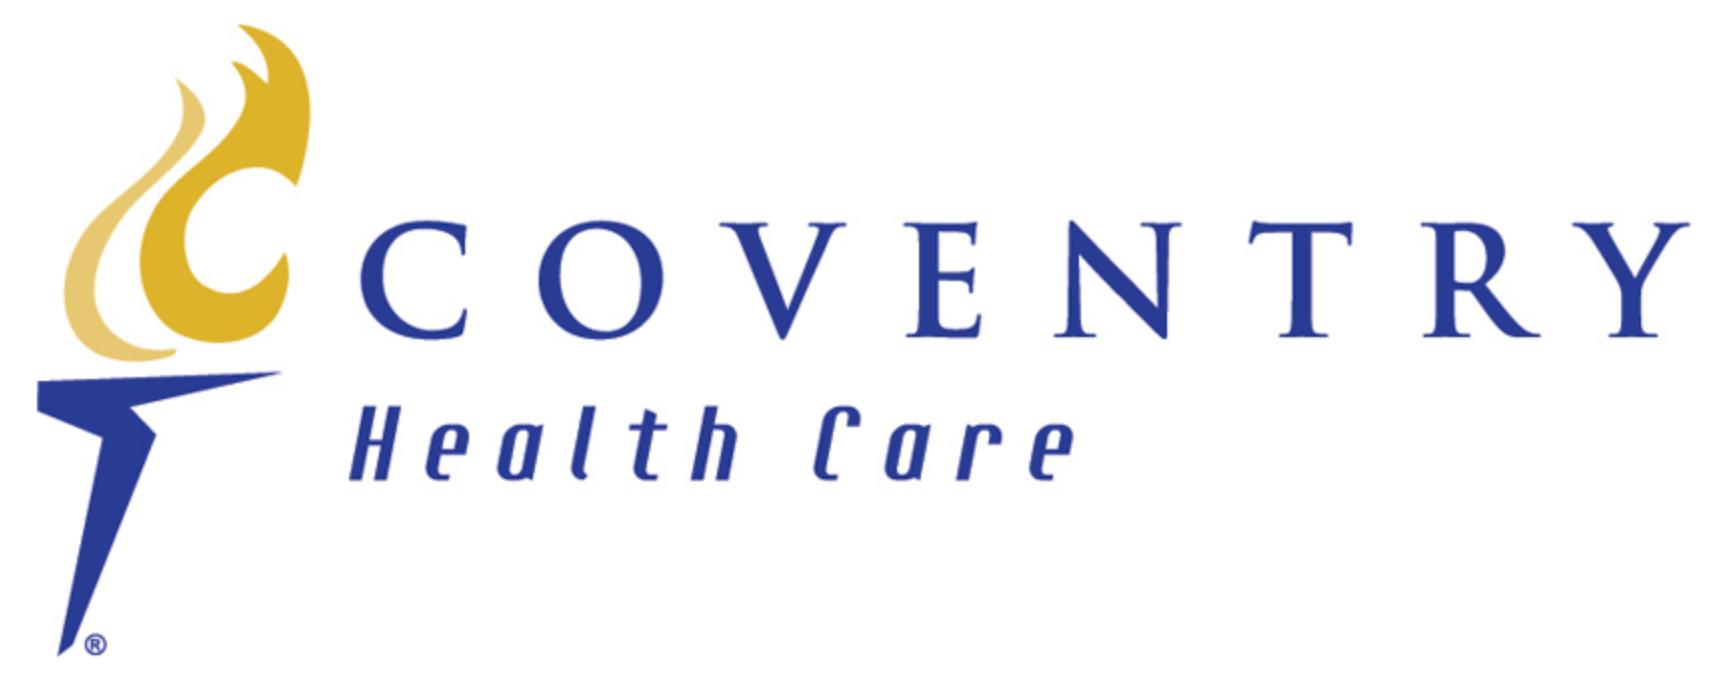 coventry health care logo elite pt